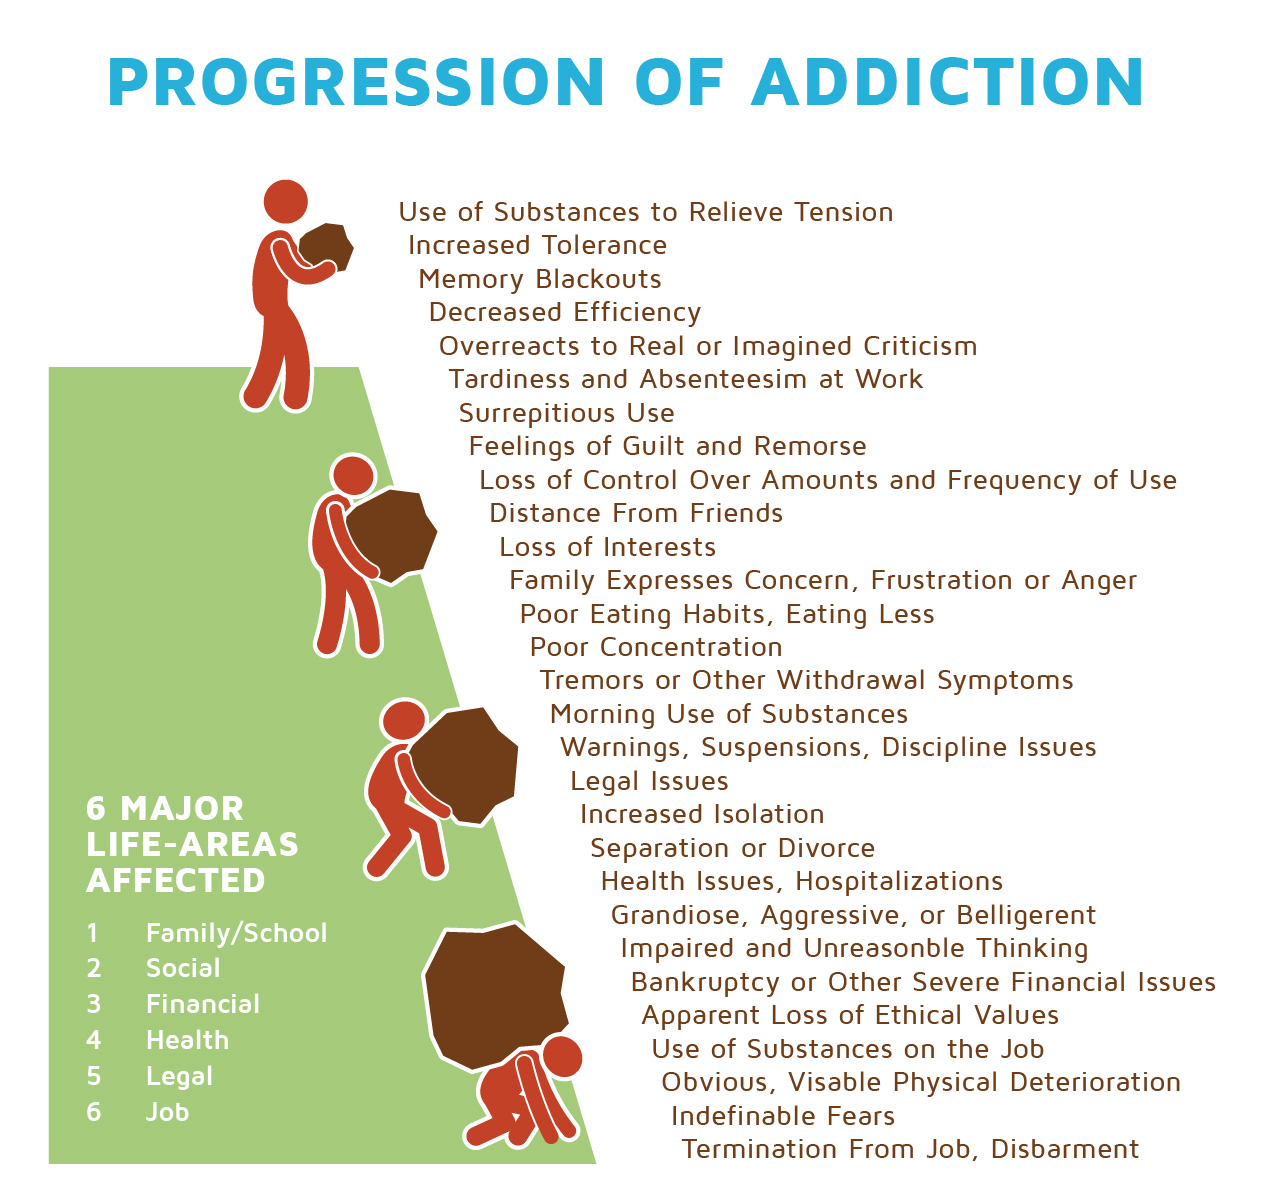 Lawyer Assistance Program Substance Abuse